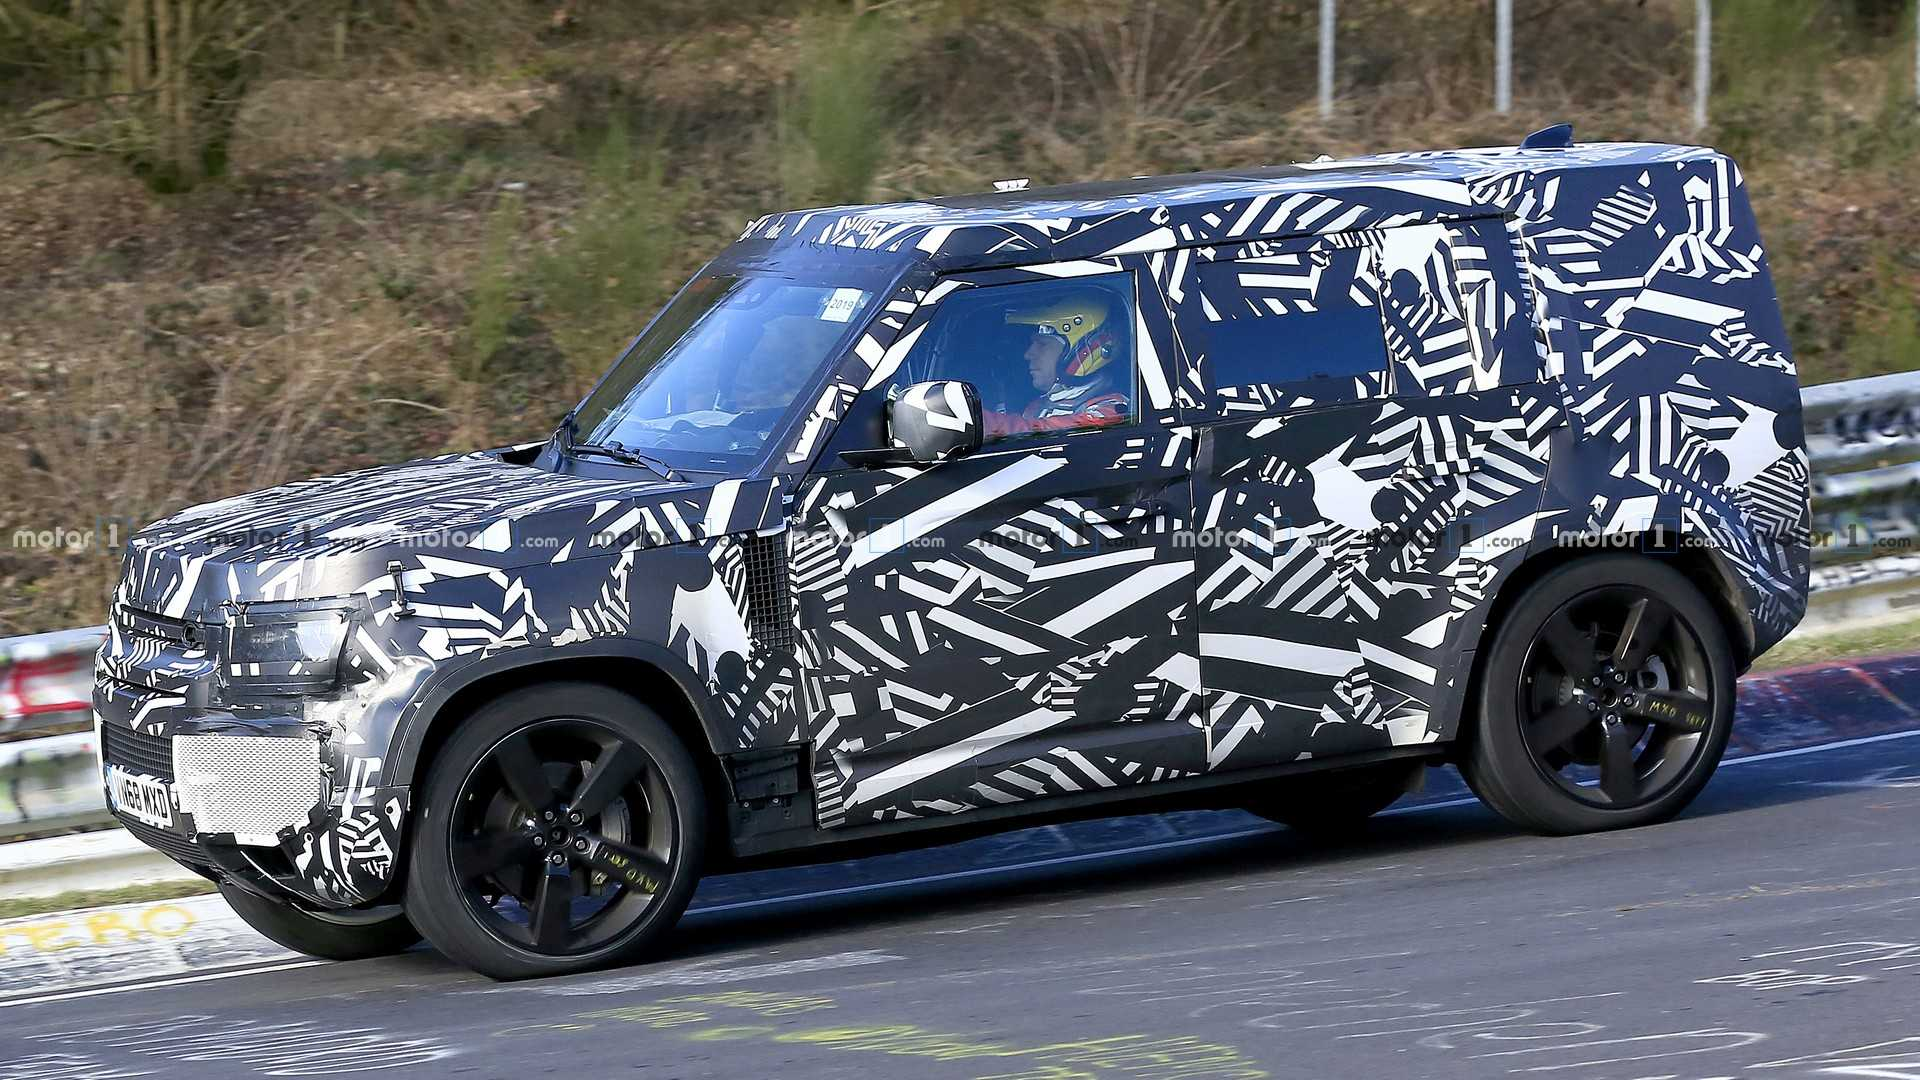 2020 Land Rover Defender Release Date >> 2020 Land Rover Defender To Be Revealed In September